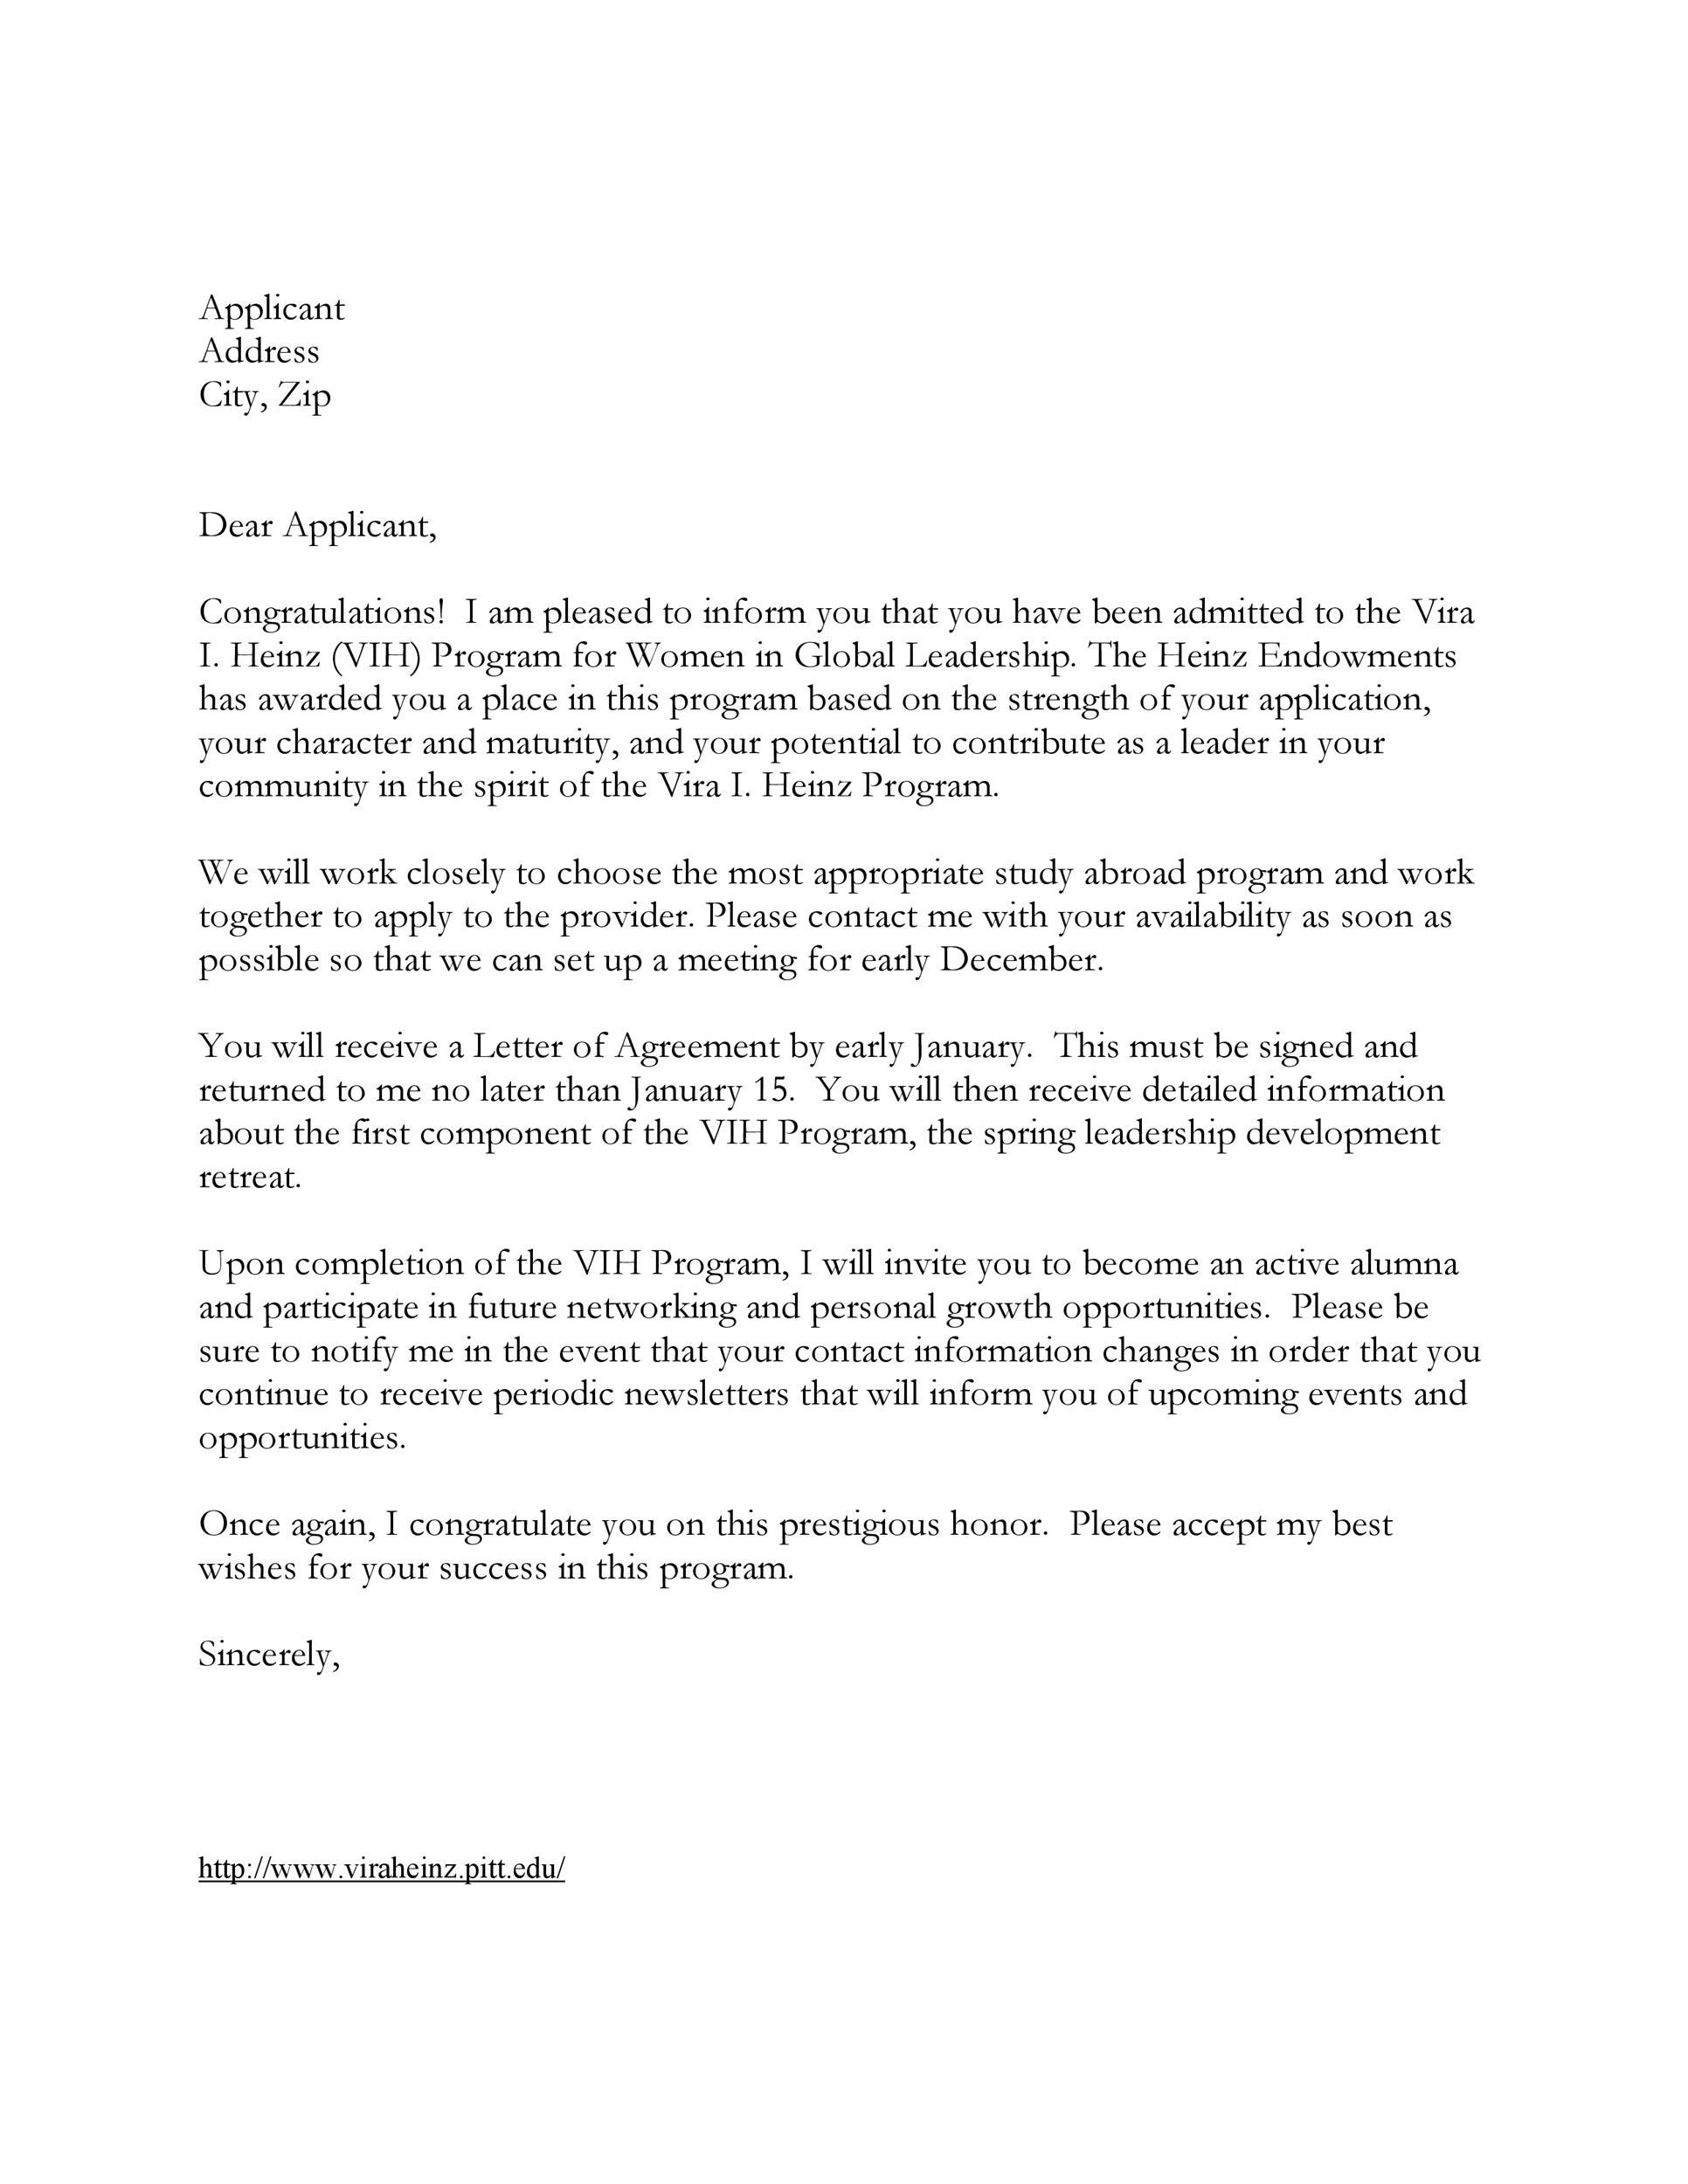 Free congratulations letter 38